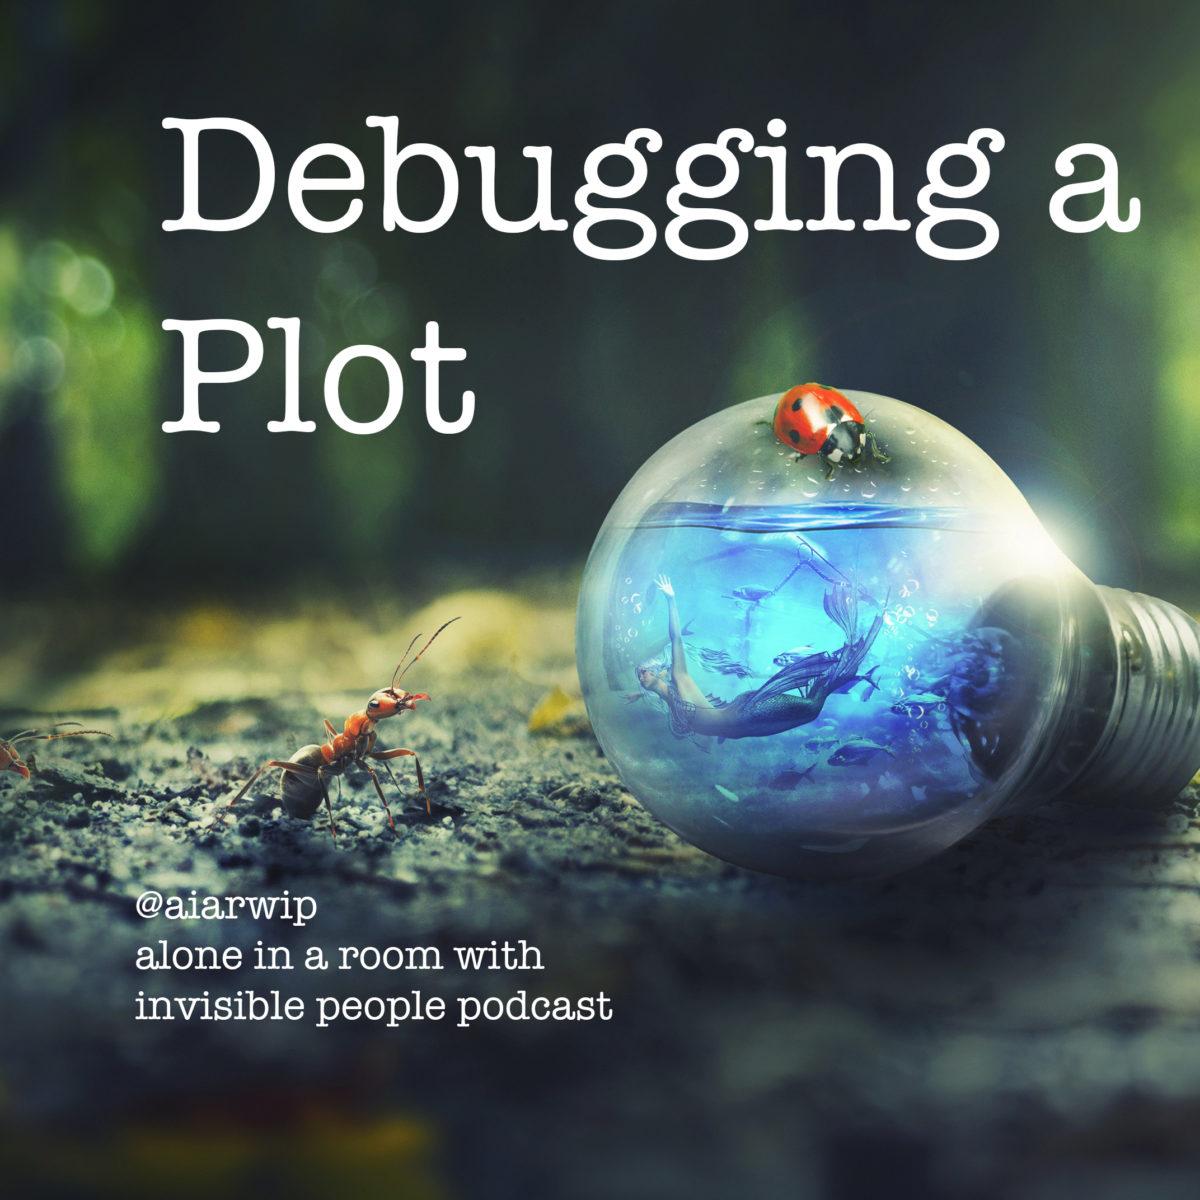 Episode 03: Debugging a Plot